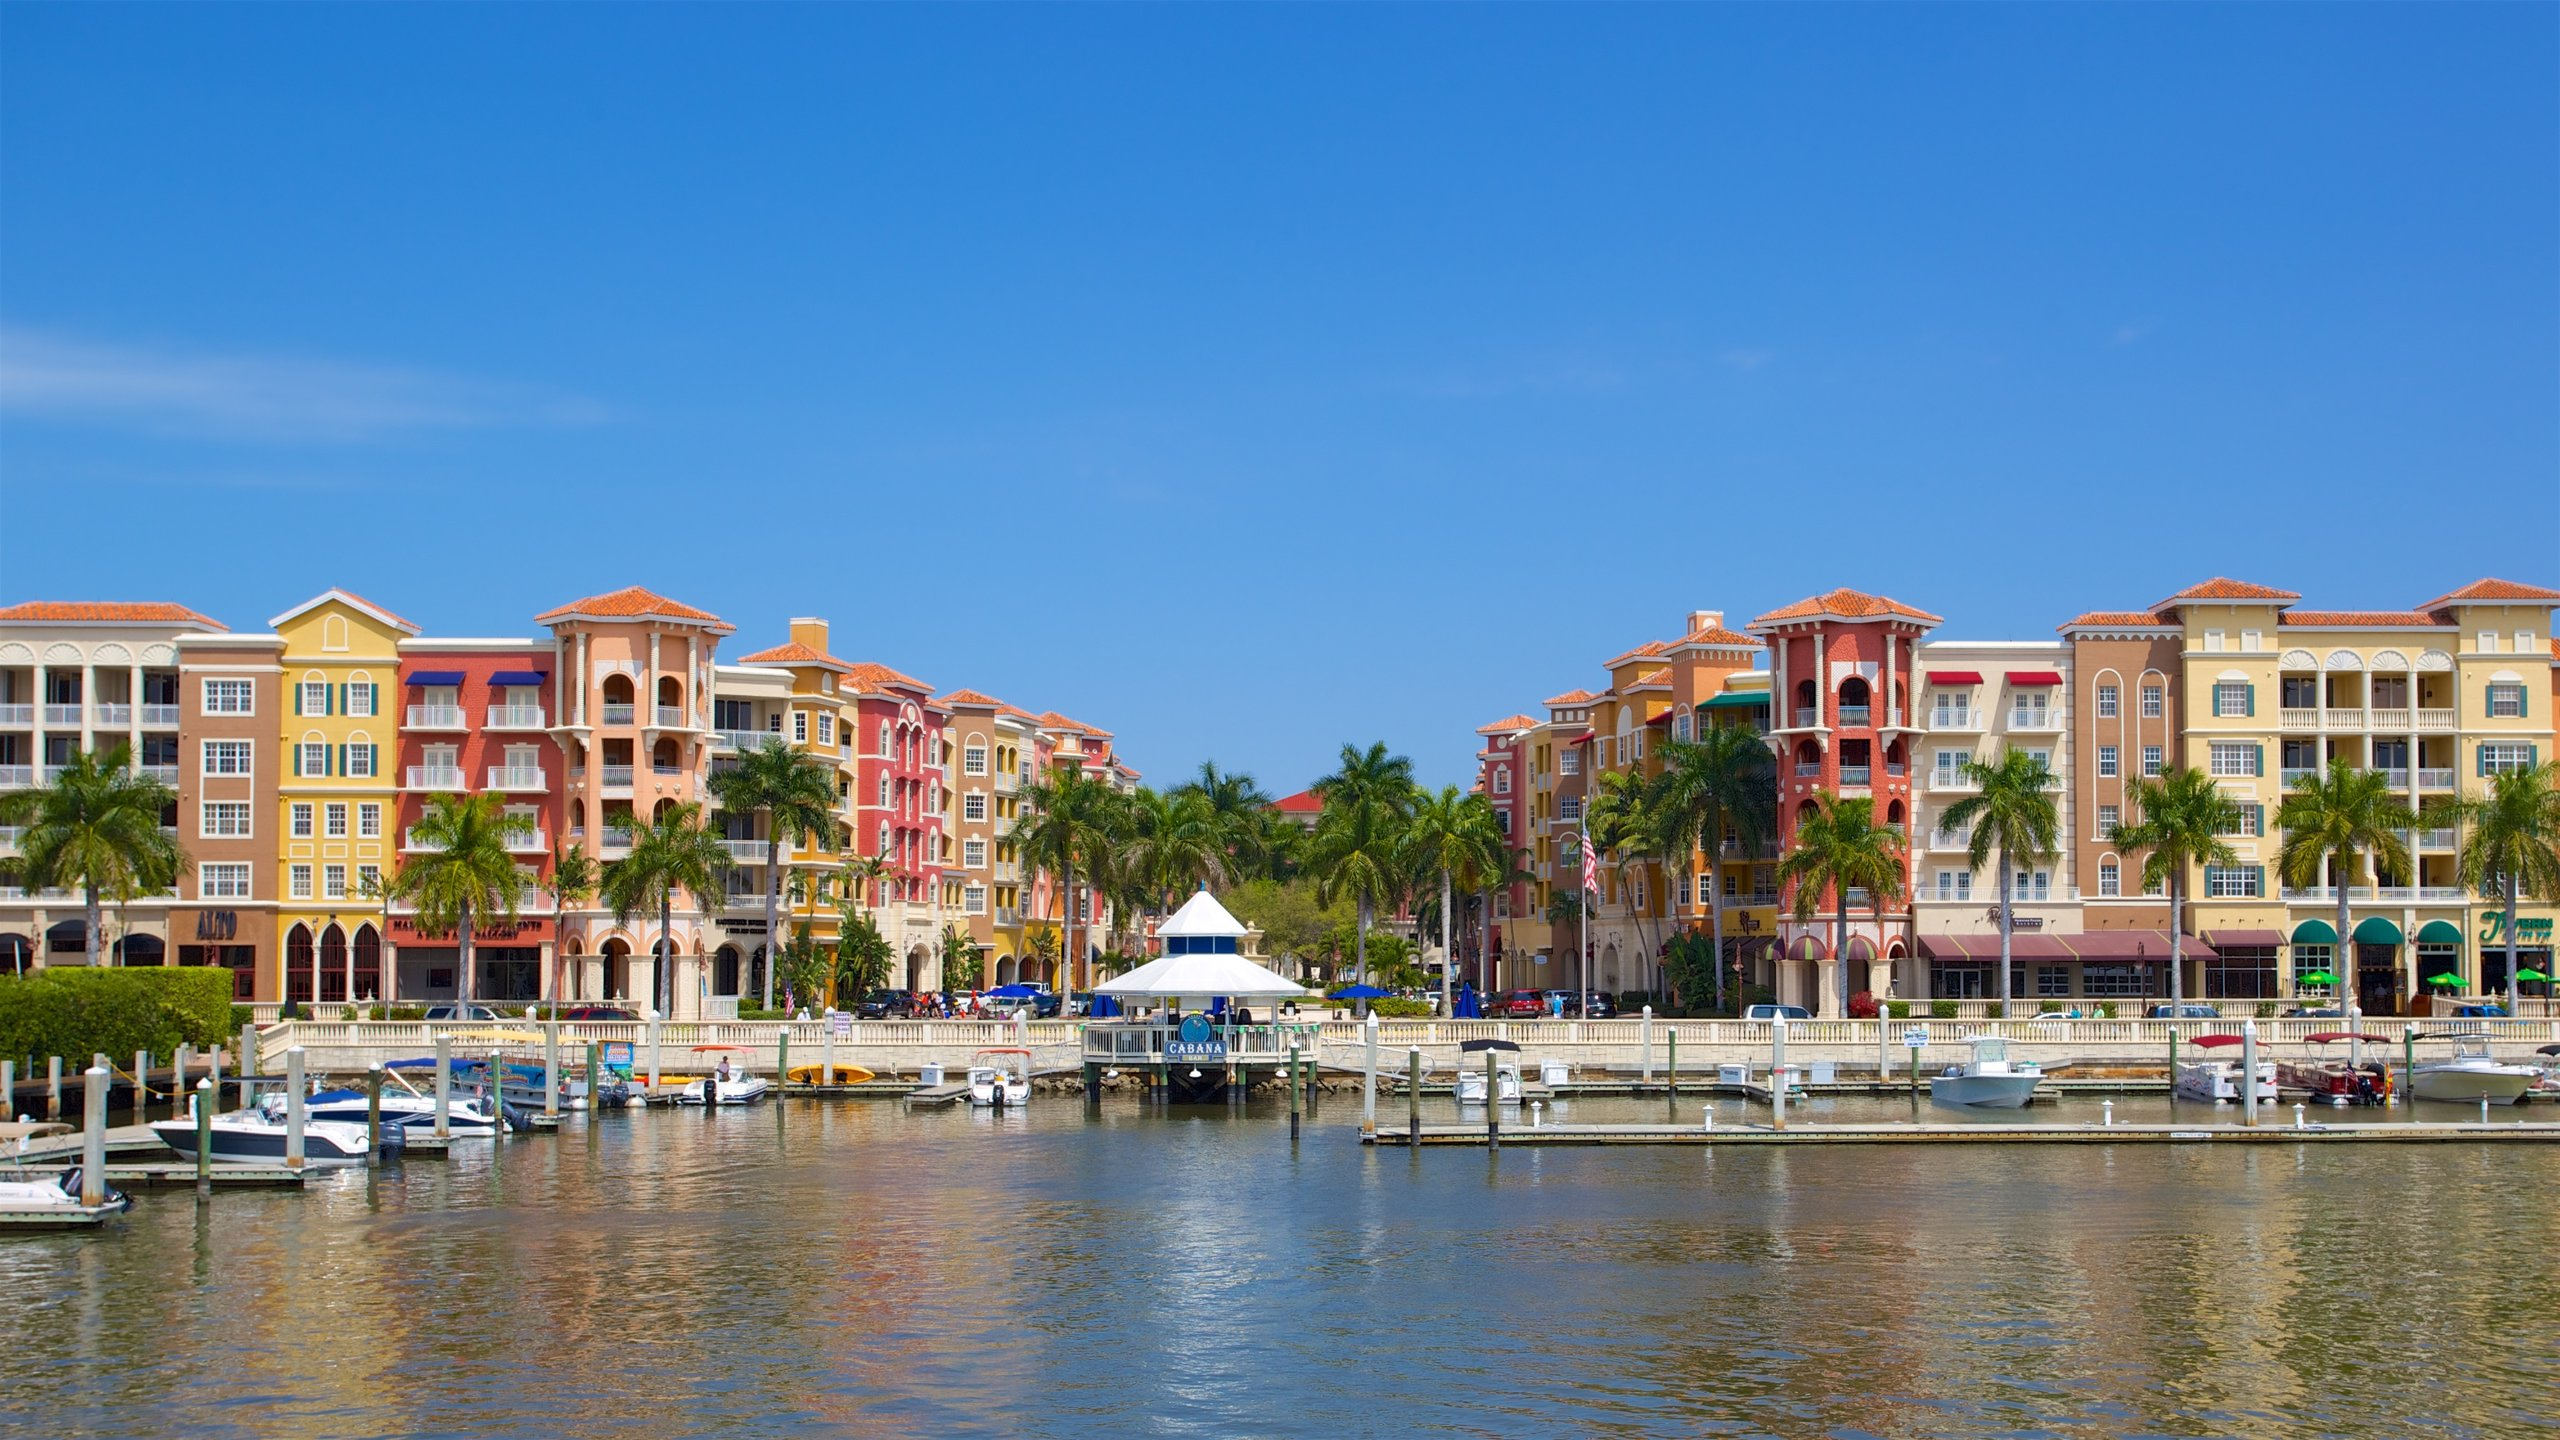 Contea di Collier, Florida, Stati Uniti d'America